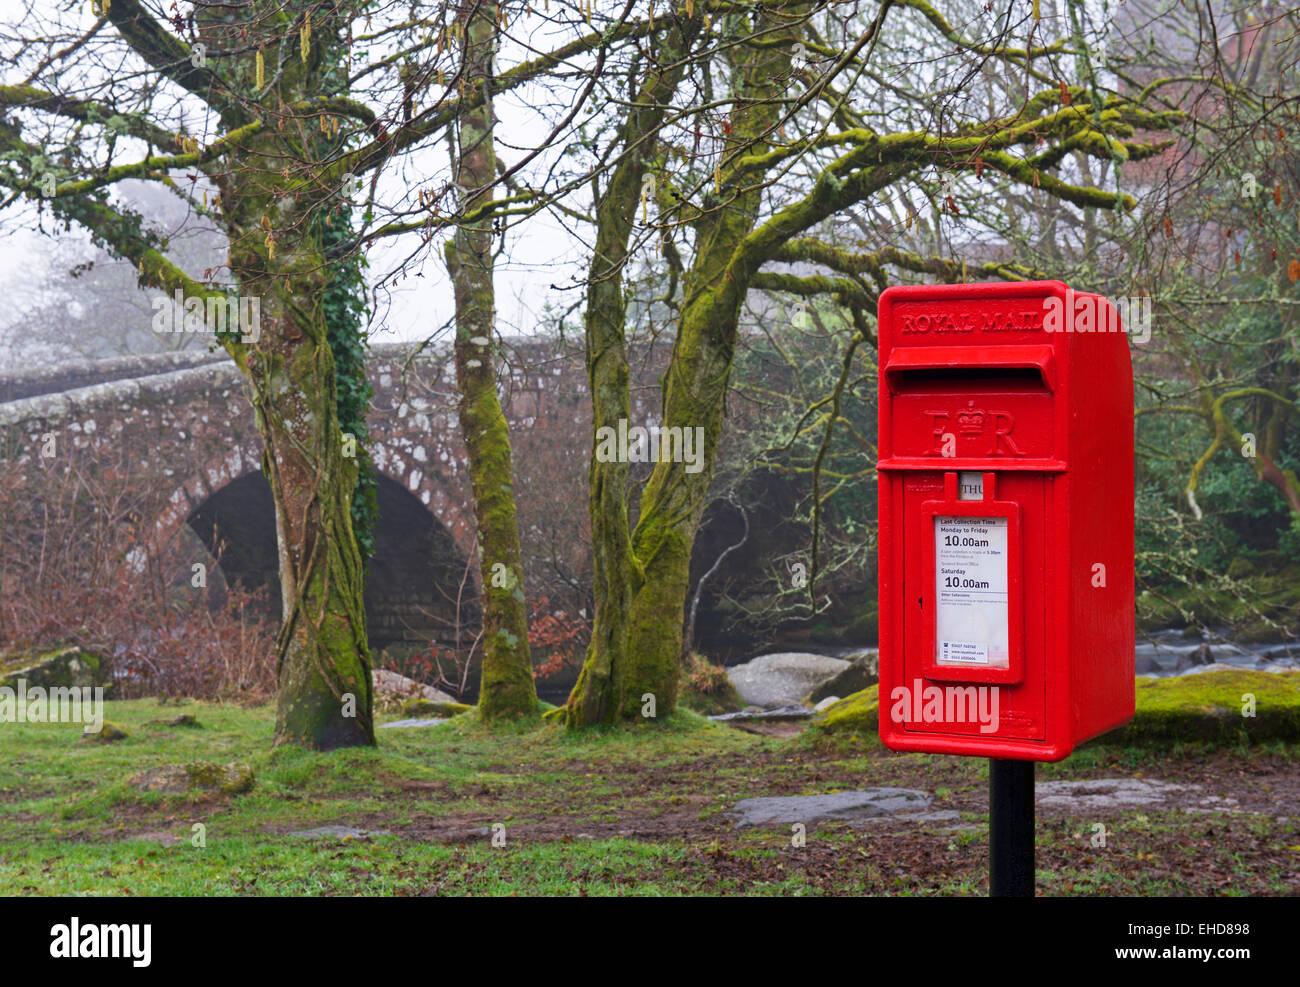 postbox-and-bridge-england-uk-EHD898.jpg